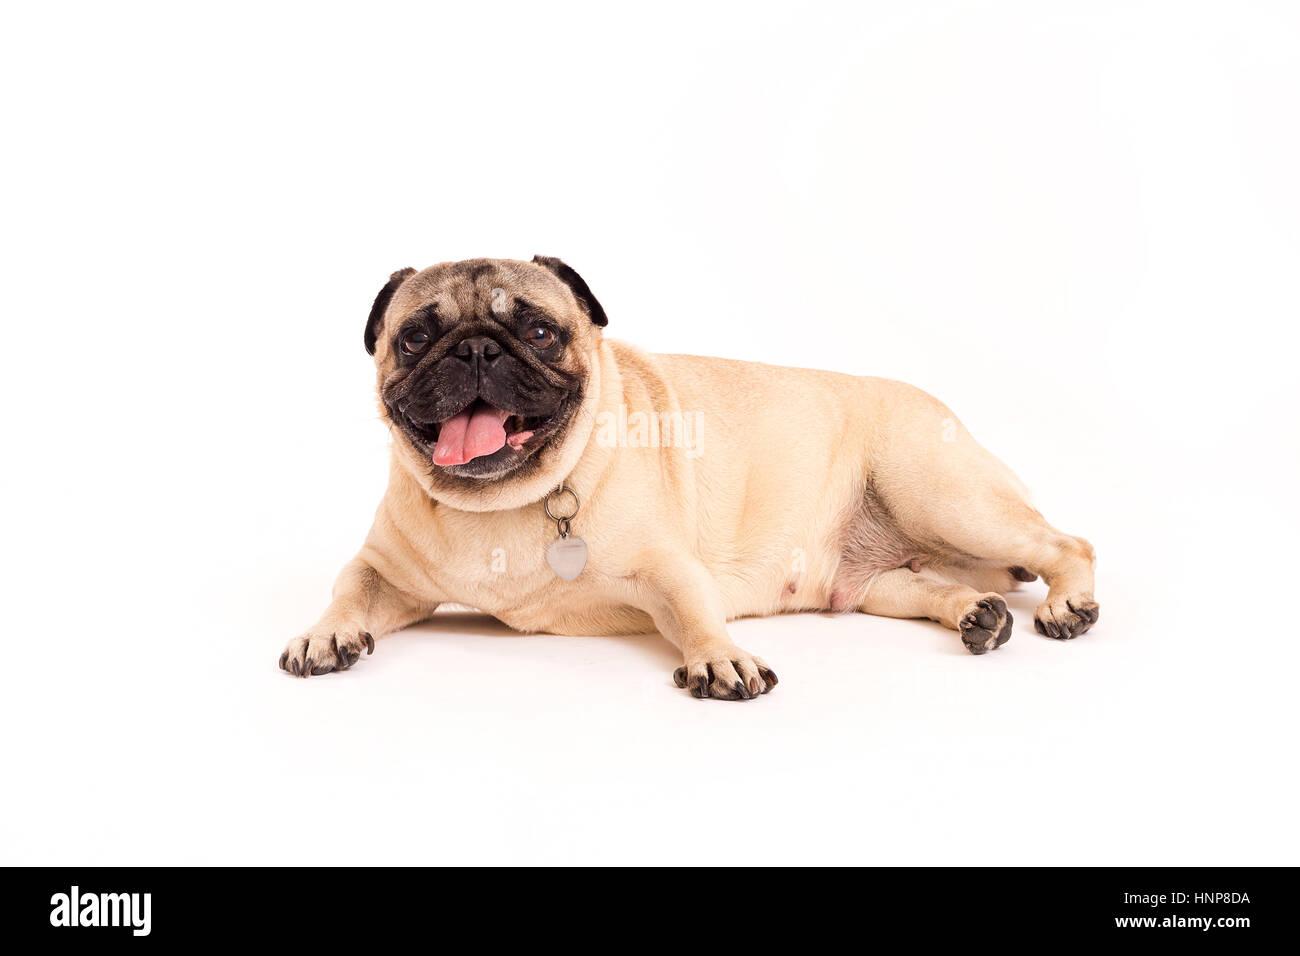 Pug resting - Stock Image